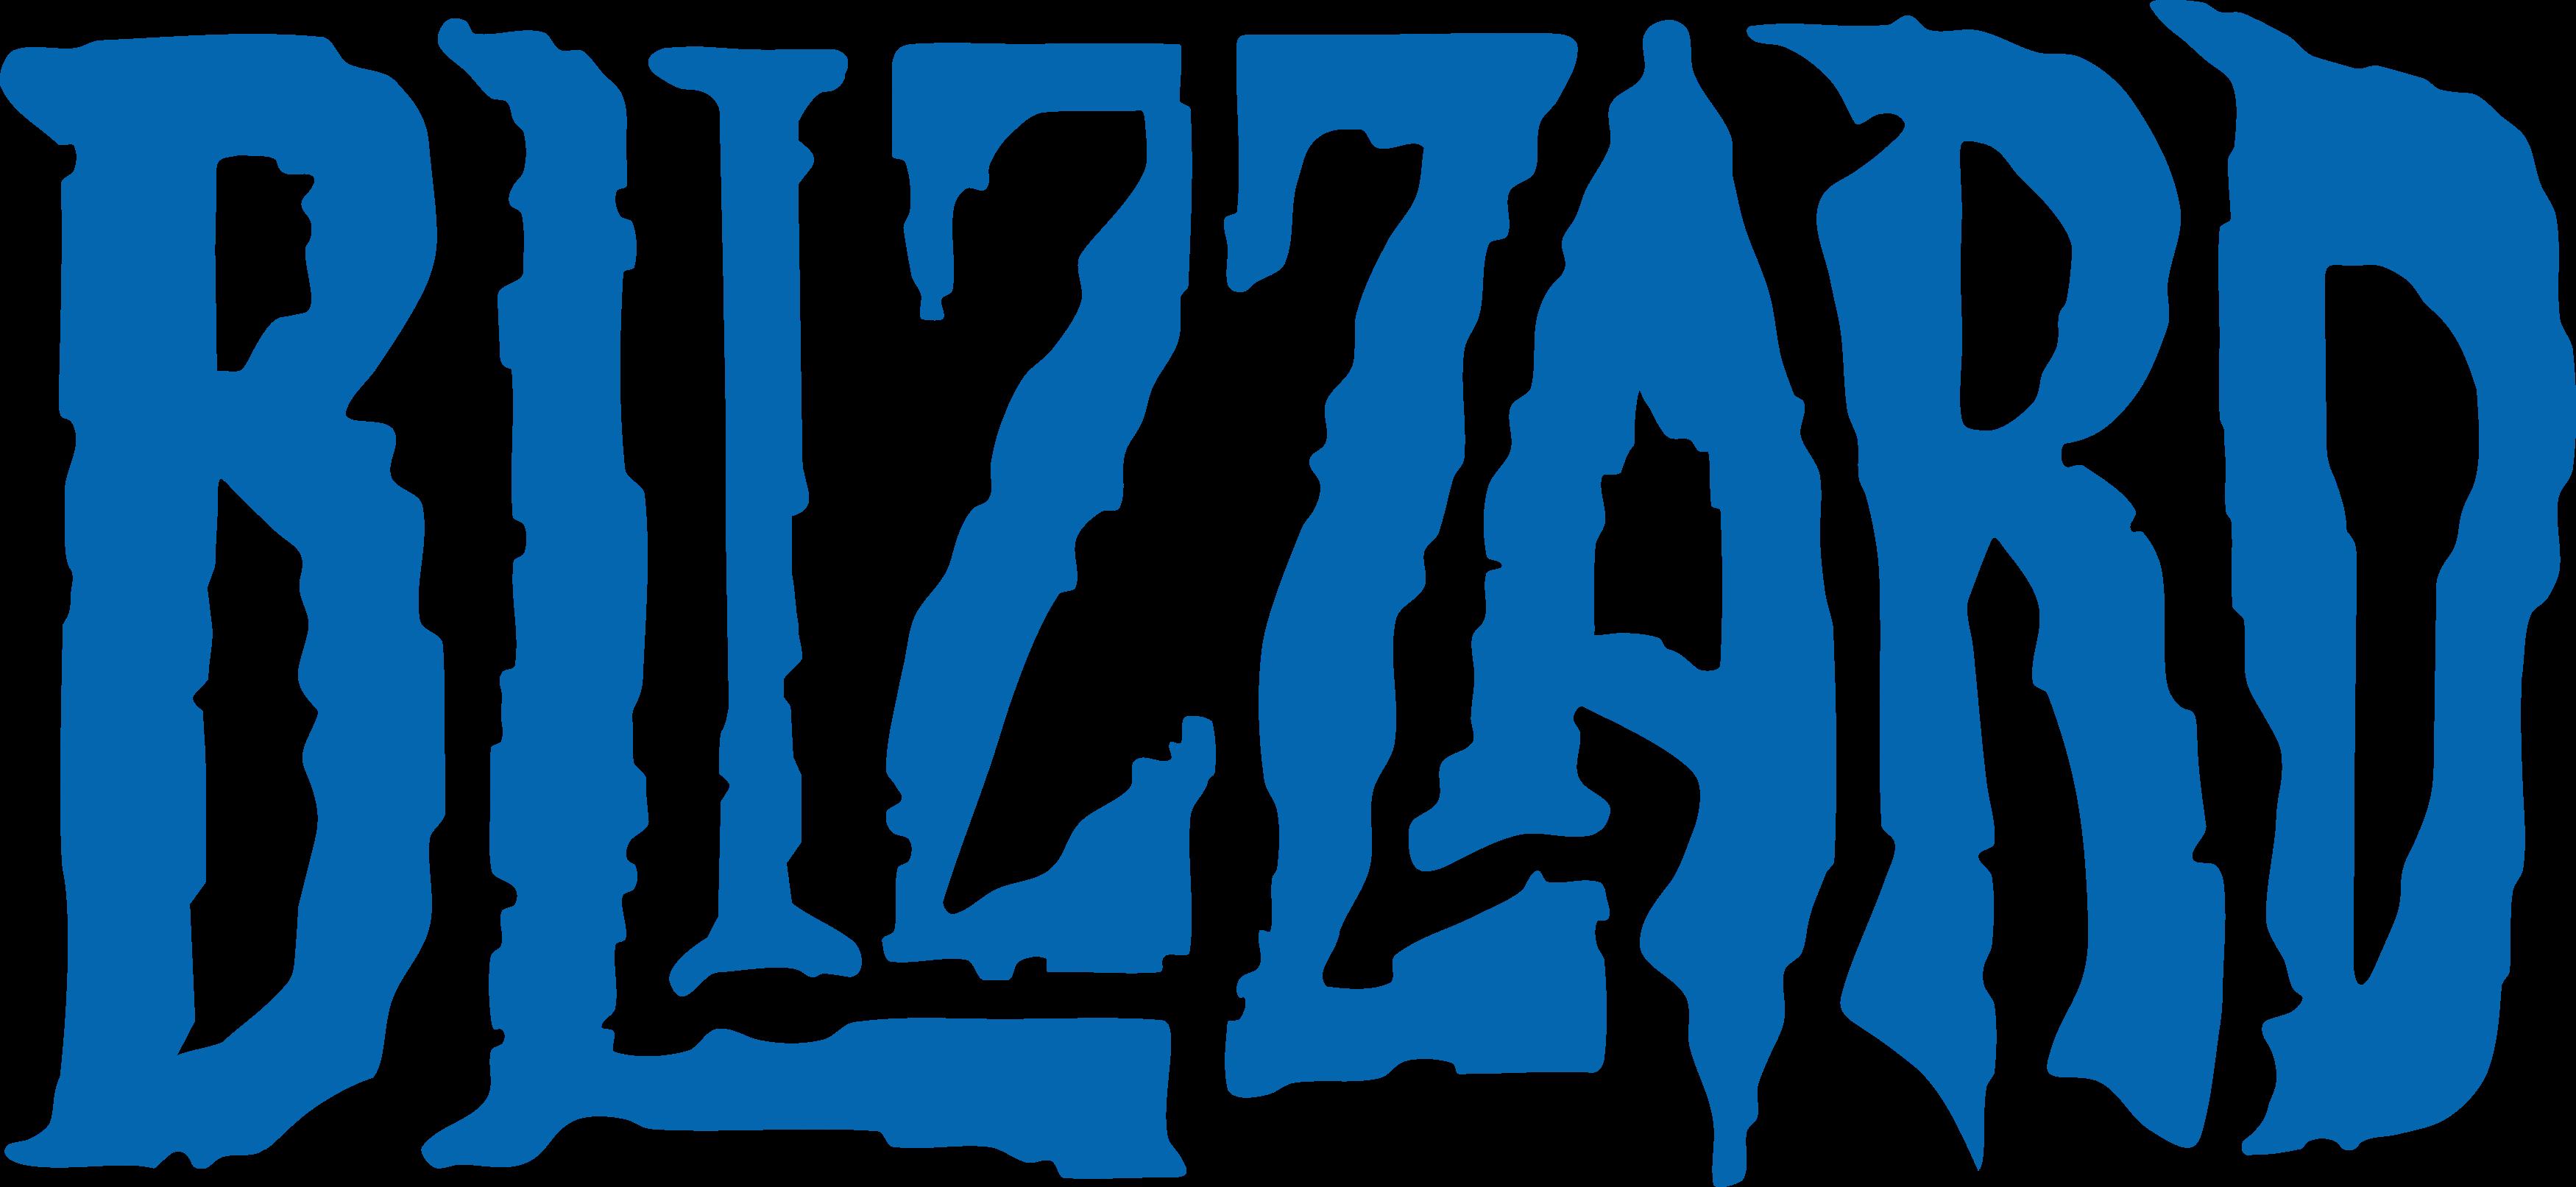 blizzard-logo-1